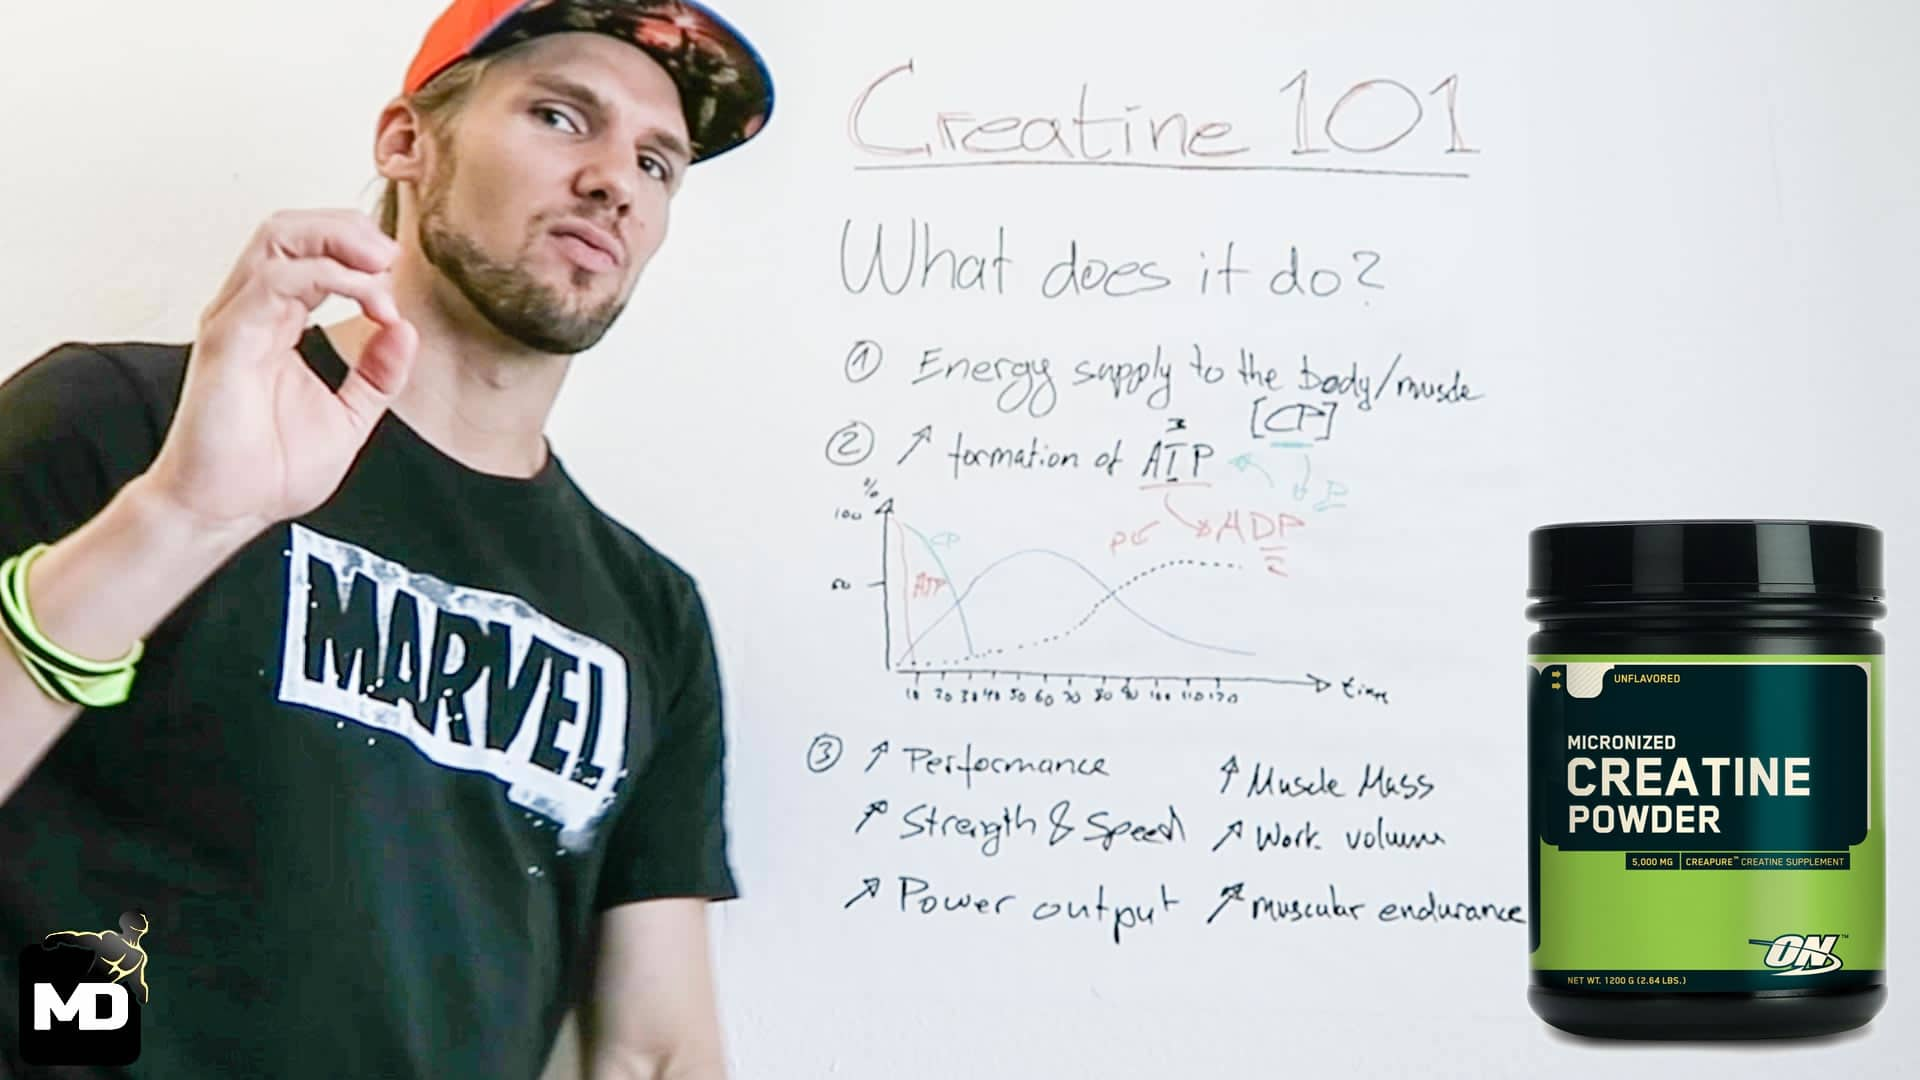 [Creatine 101] - What Is Creatine?